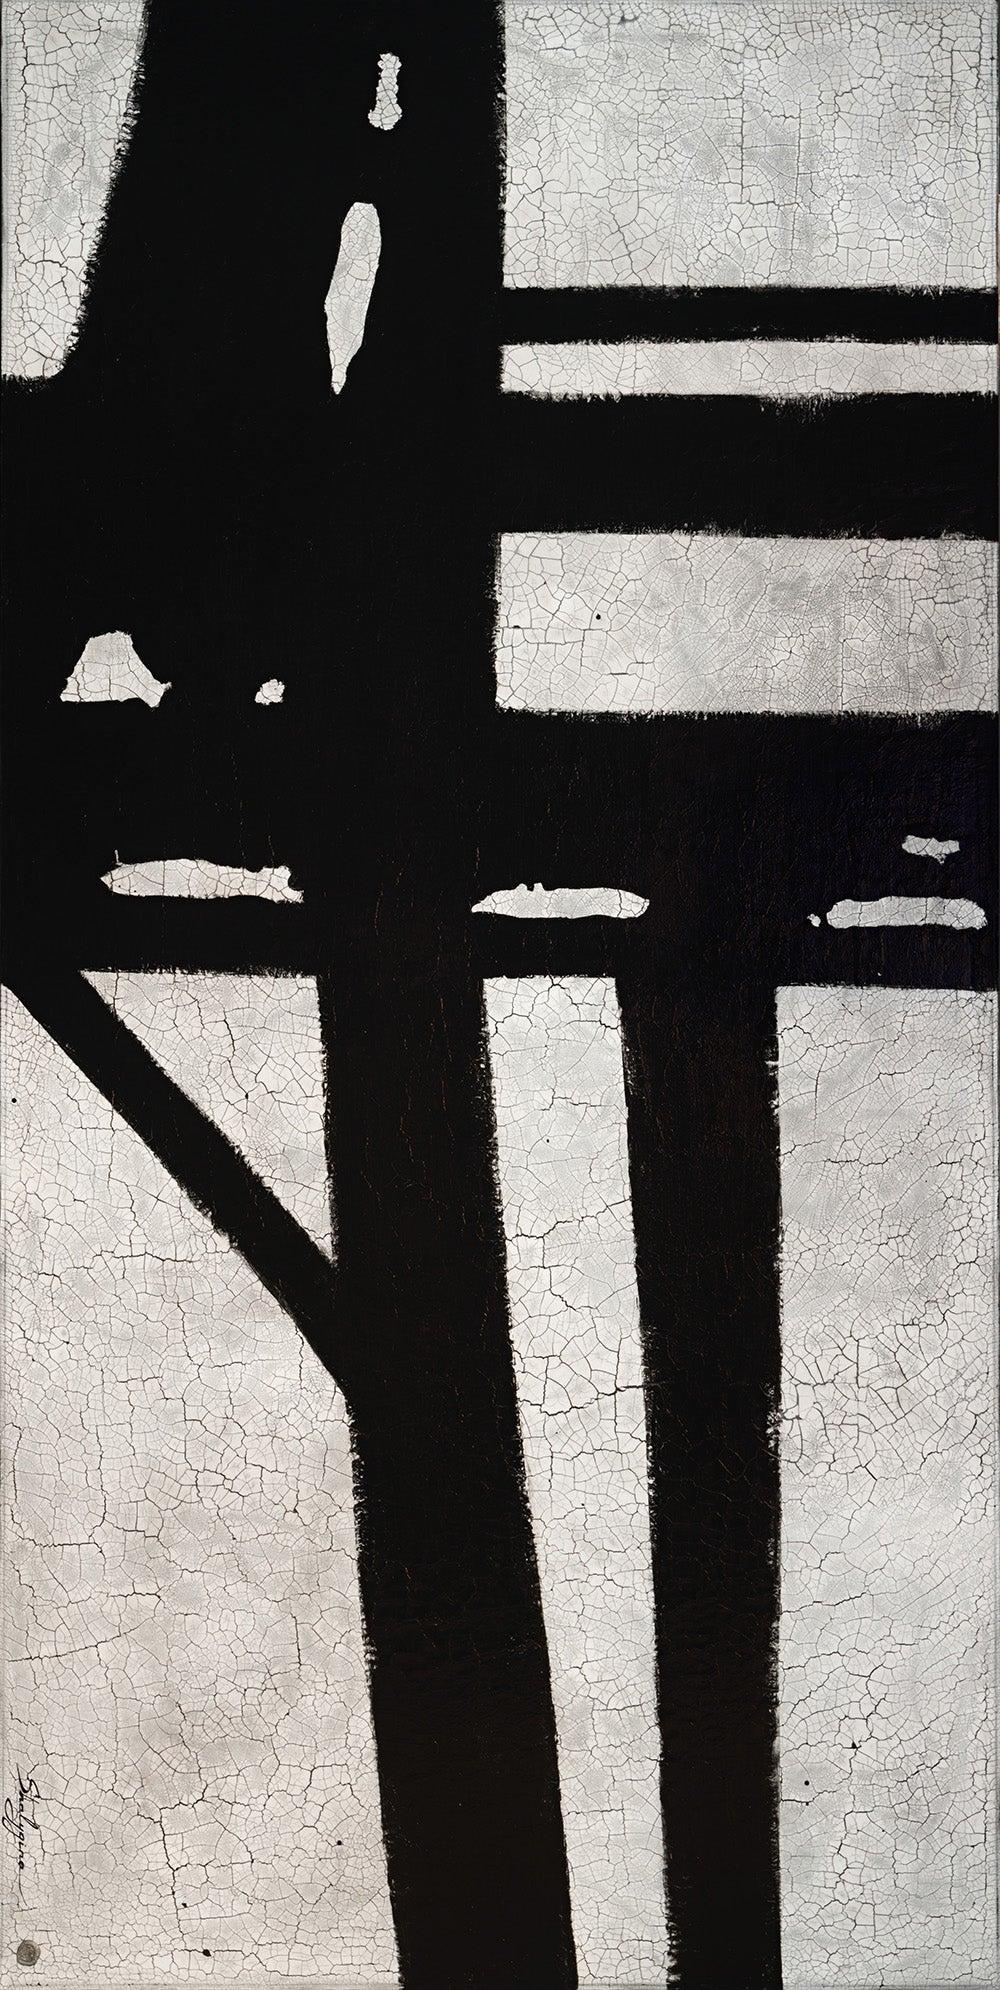 Oversized Black White Franz Kline Inspired Modern Contemporary Abstract 96x48